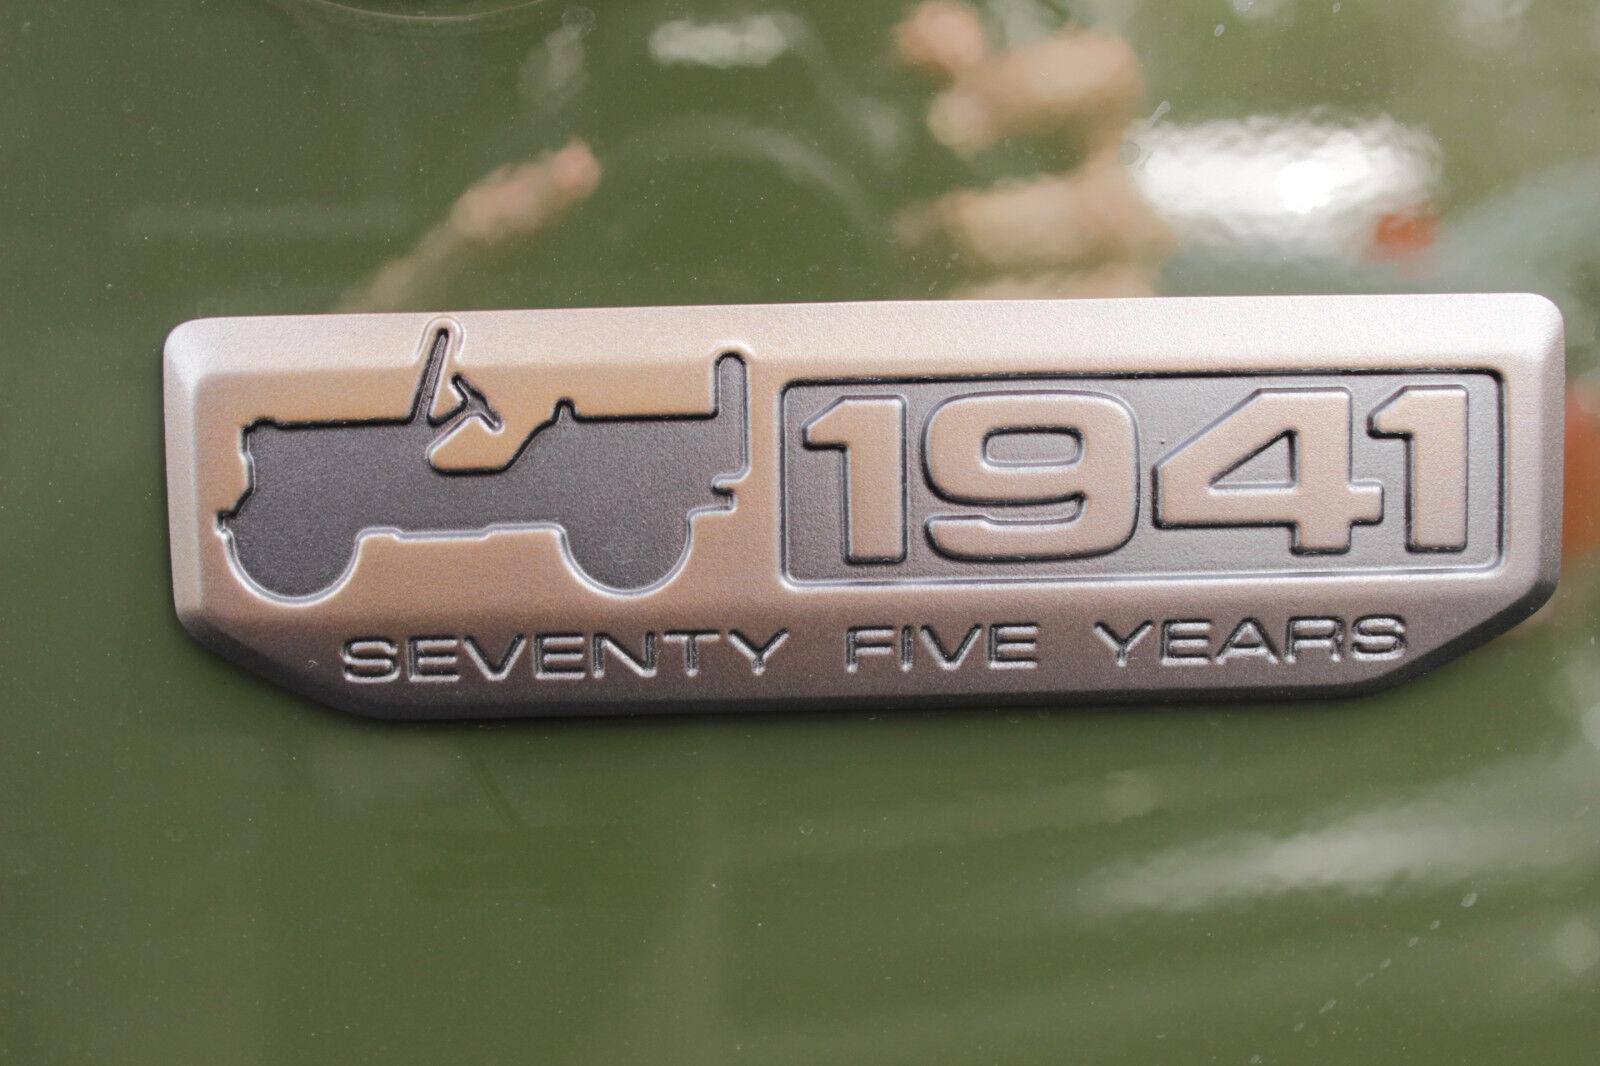 NEW OEM JEEP CHEROKEE ANNIVERSARY BADGE 1941 X 2 RIGHT//LEFT DOOR MOPAR EMBLEM